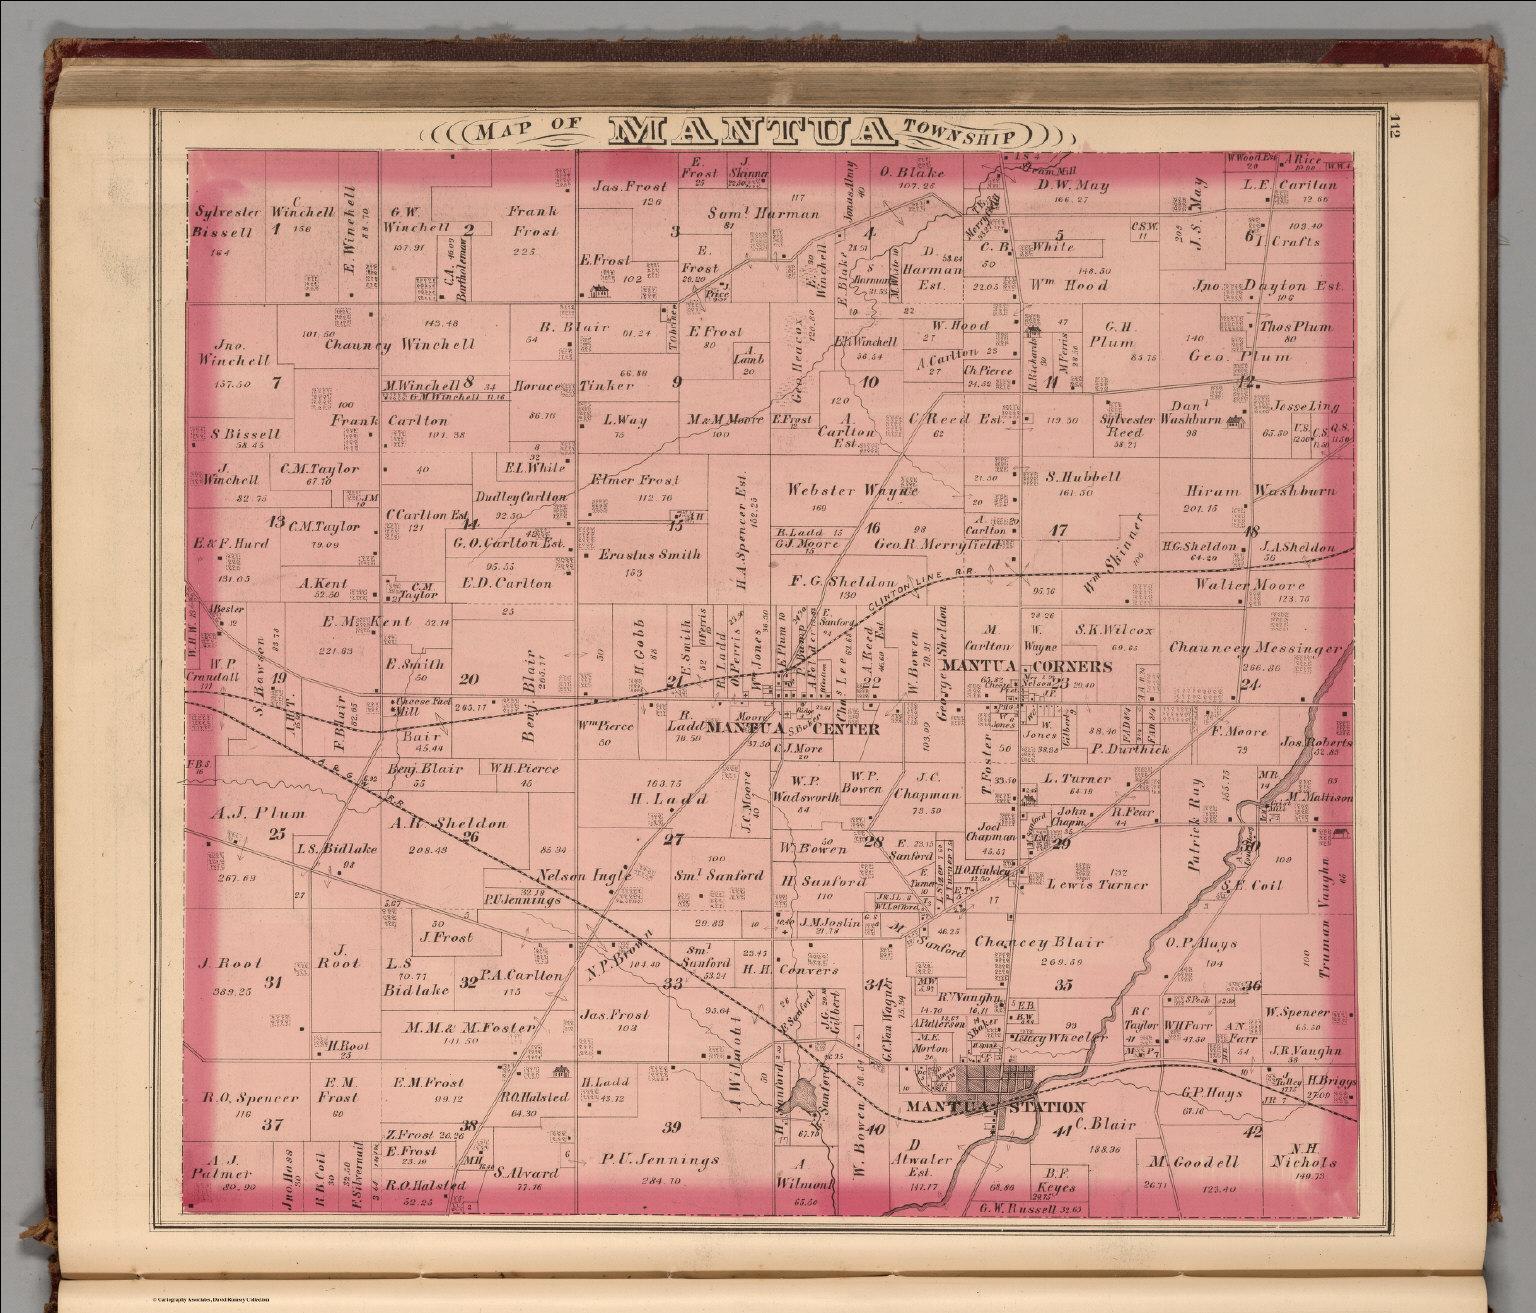 Mantua Township Portage County Ohio David Rumsey Historical Map